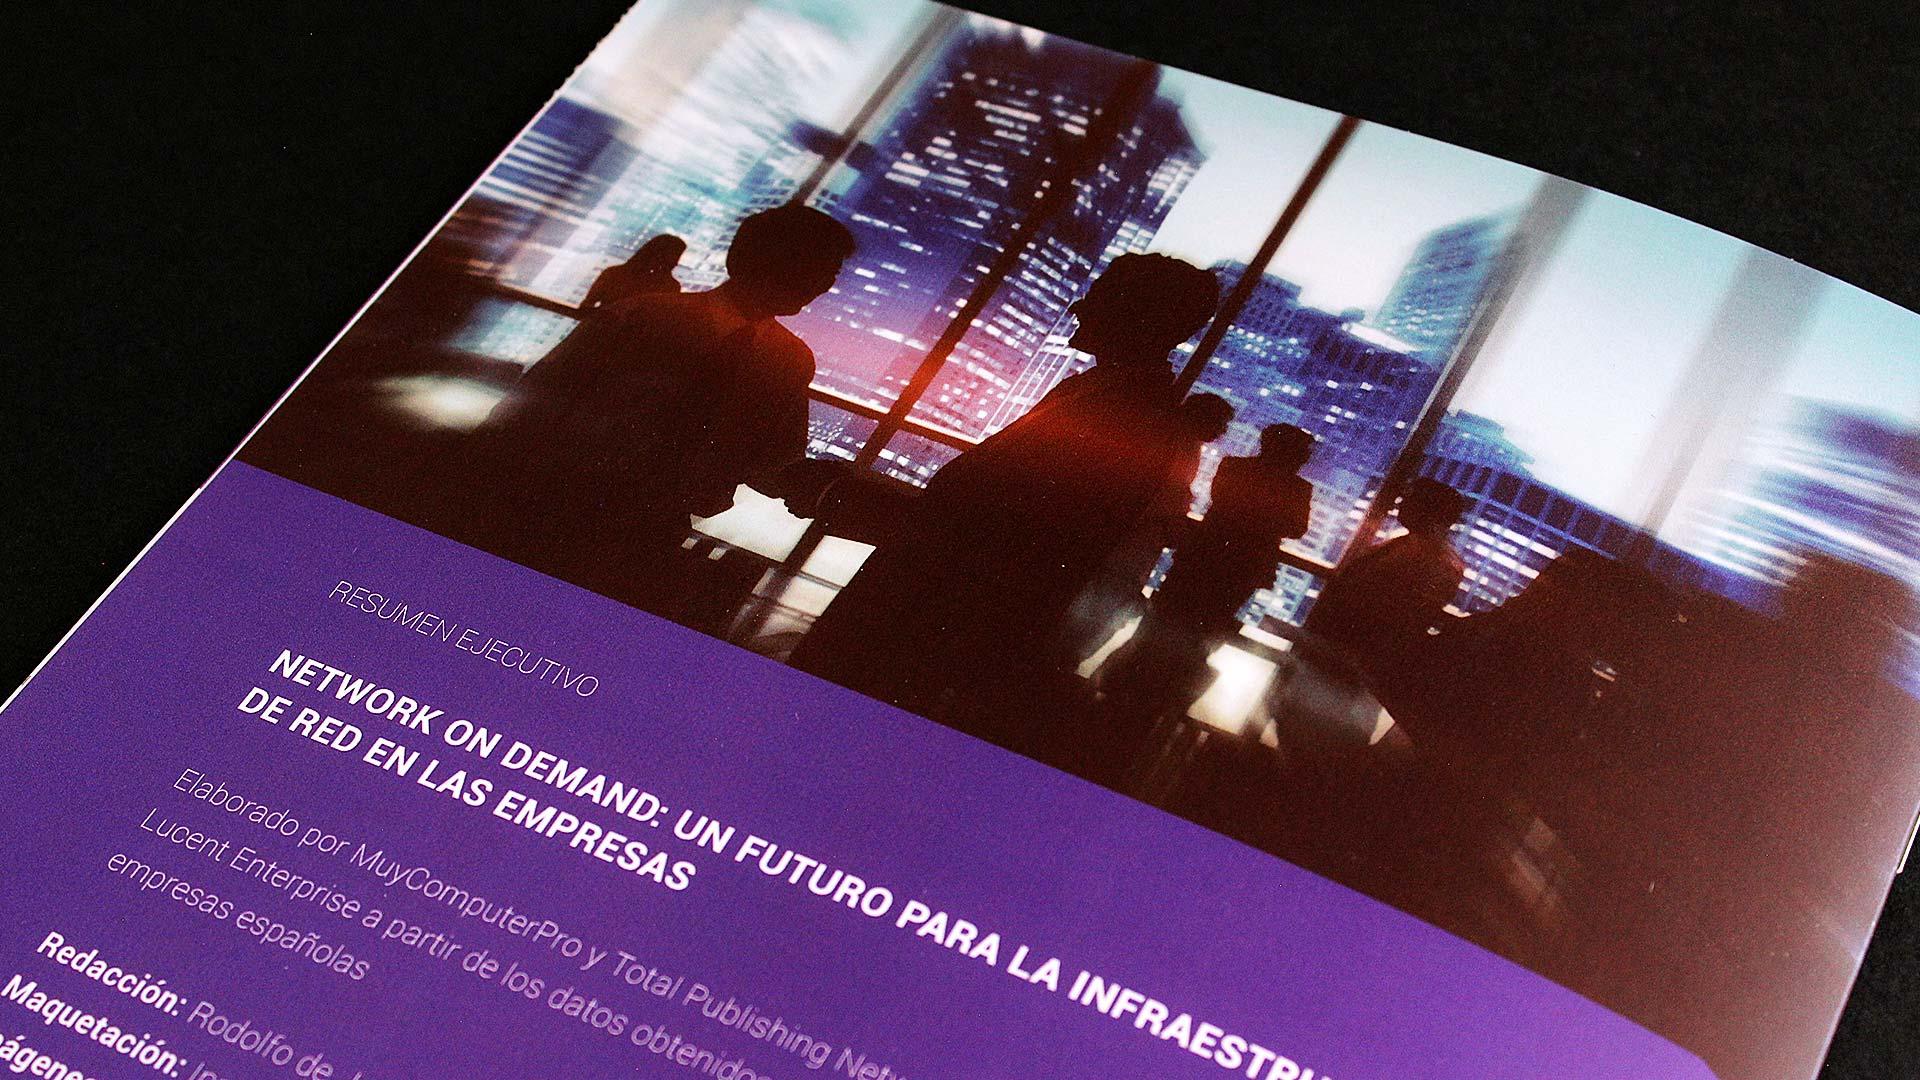 alcatel-content-marketing-informe-resumen-ejecutivo-networkondemand-ebook-2016-24